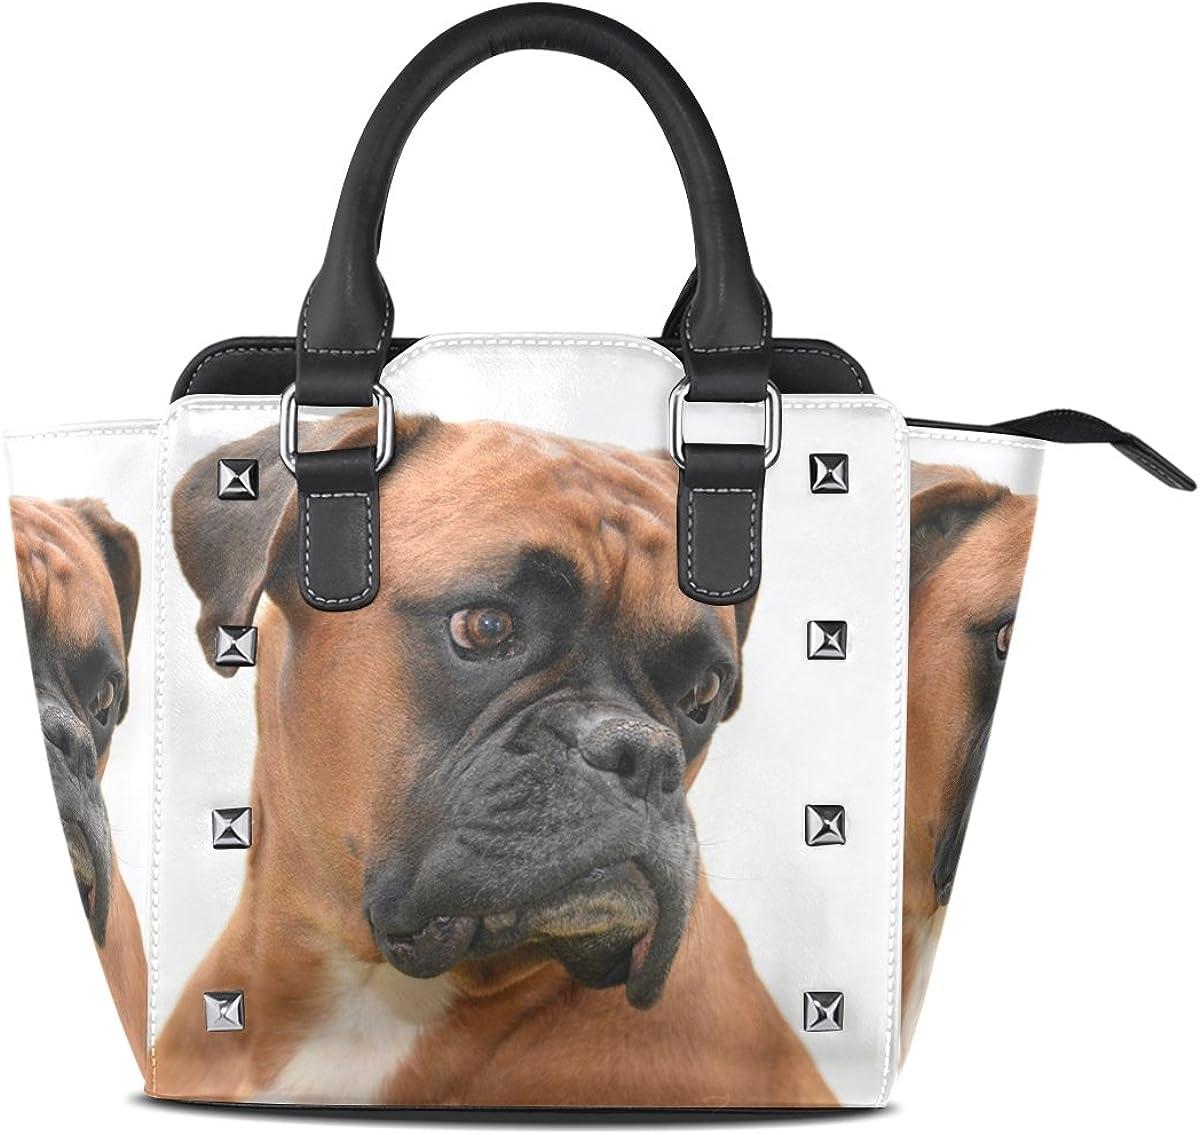 imobaby Dog Pet PU Leather Top-Handle Handbags Single-Shoulder Tote Crossbody Bag Messenger Bags For Women